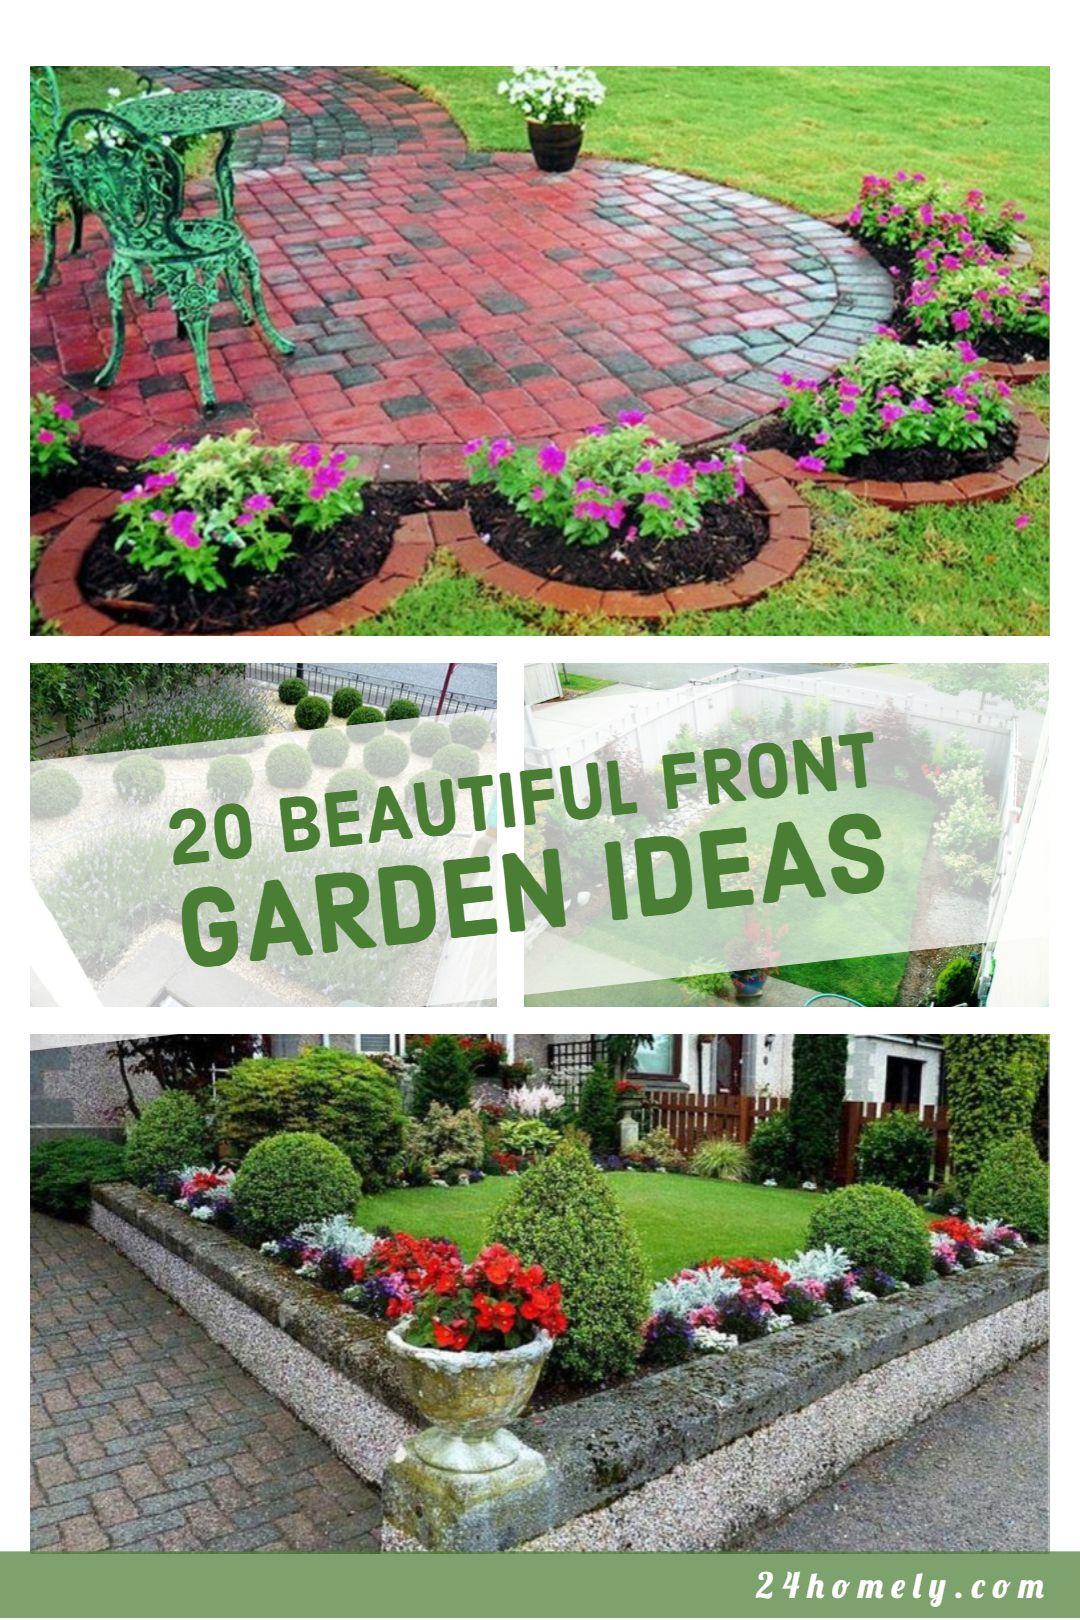 20 Beautiful Front Garden Ideas That Can Make You Fall In Love Front Garden Front Garden Design Courtyard Garden